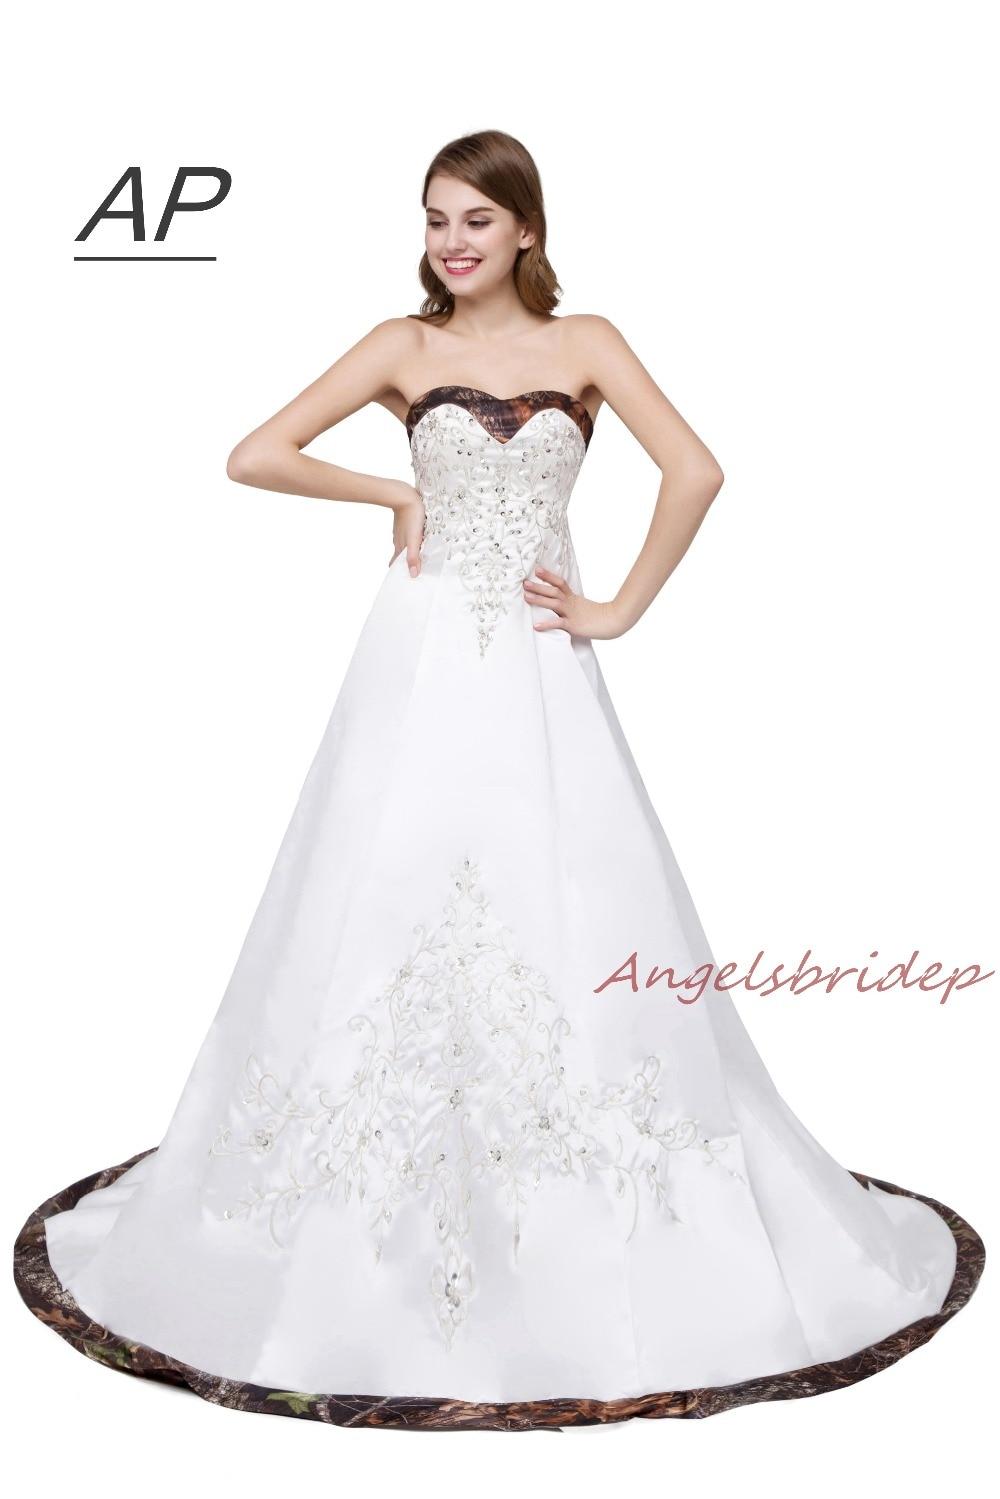 Angelsbridep White/camo Plus Size Wedding Dress Vestido De Noiva Fashion Sweetheart Floor-length Embroidery Charming Bride Dress Weddings & Events